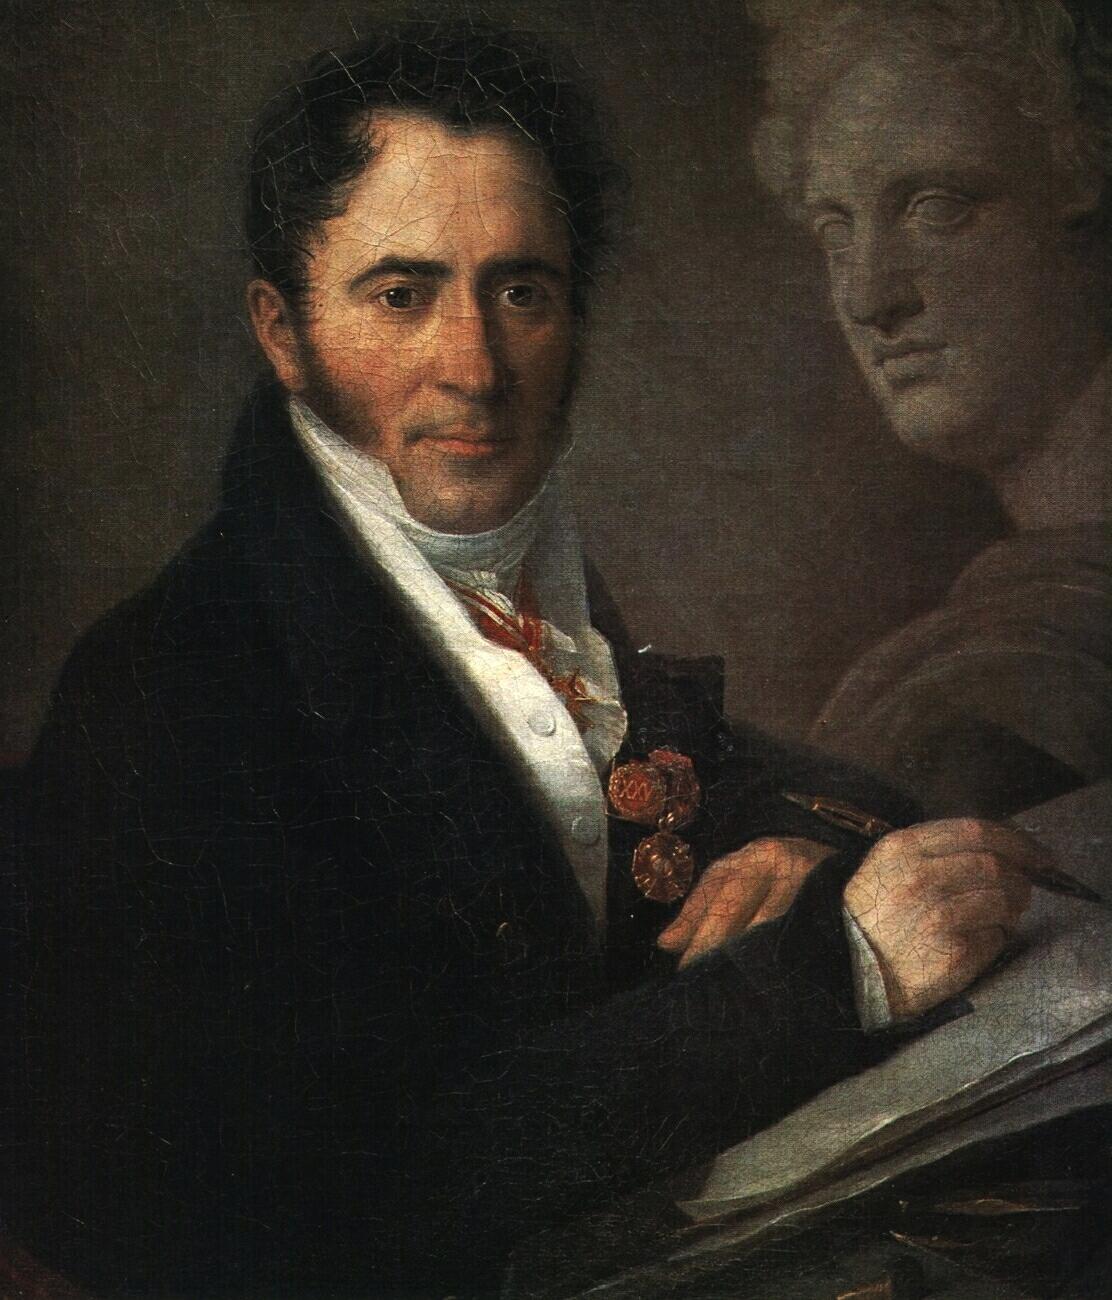 Portrait of the Artist N.I. Utkin with a Pencil, 1841 - Vasily Tropinin